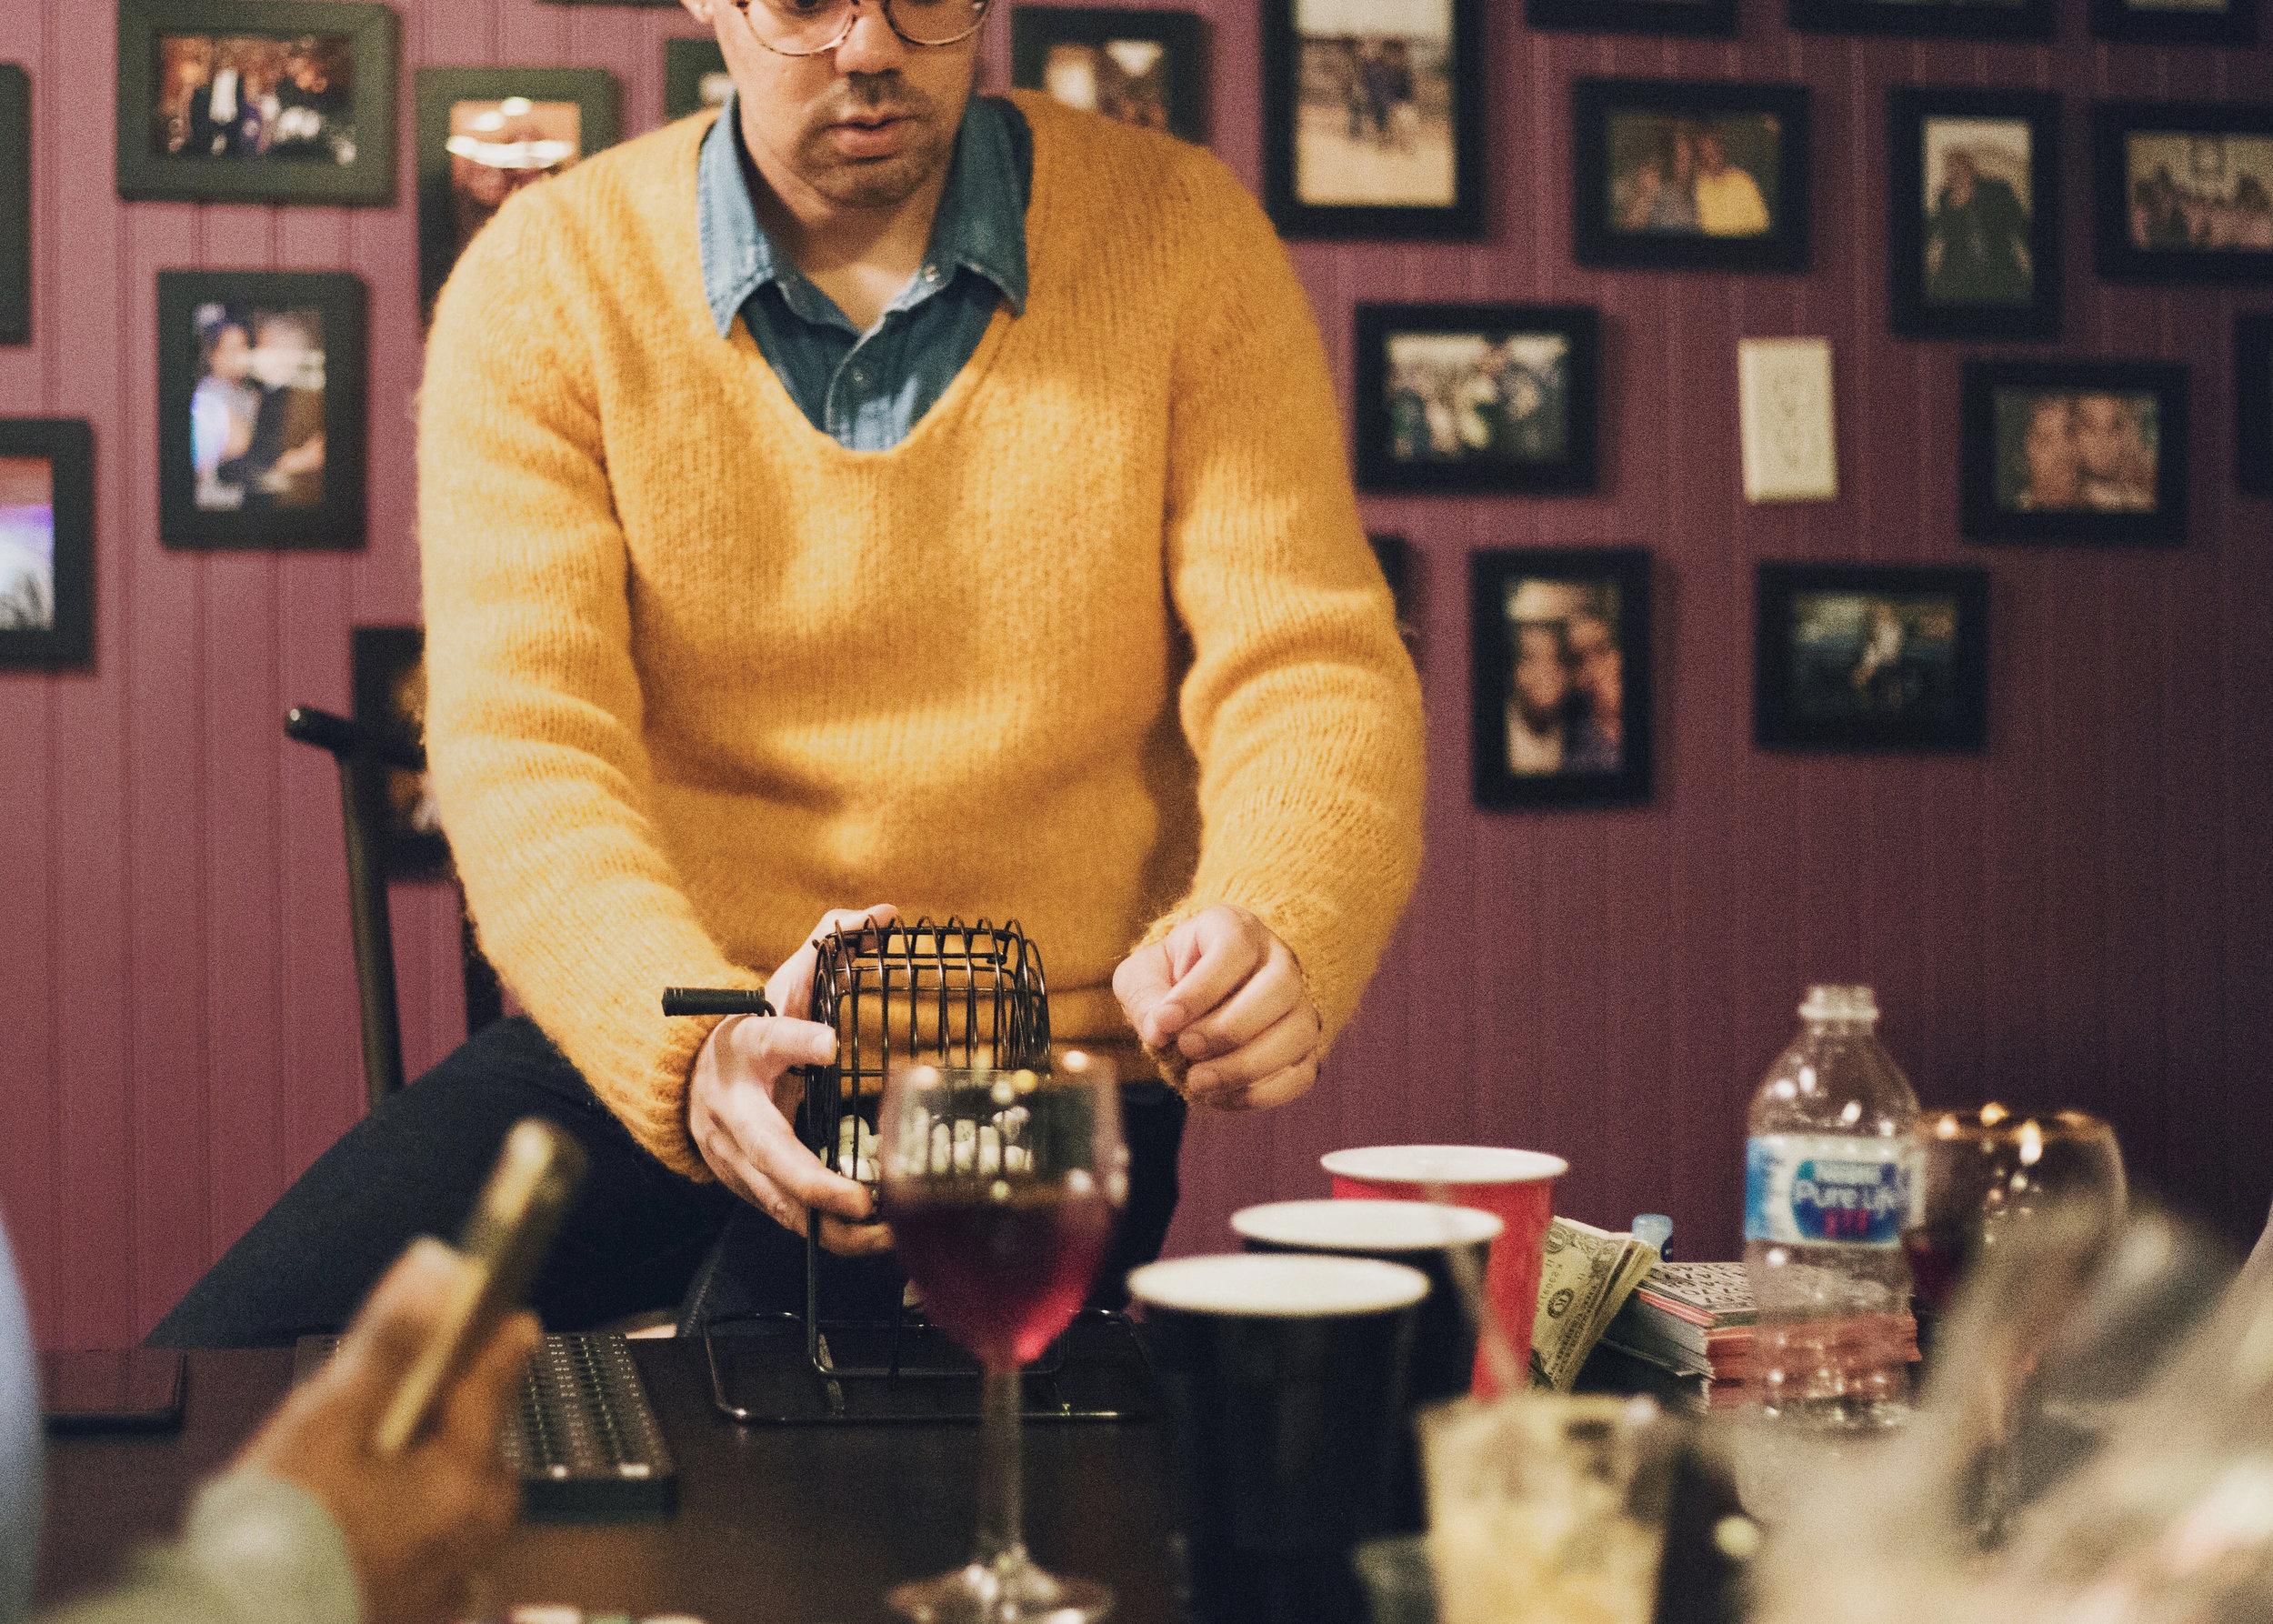 3-ways-to-update-a-boring-sweater.jpg